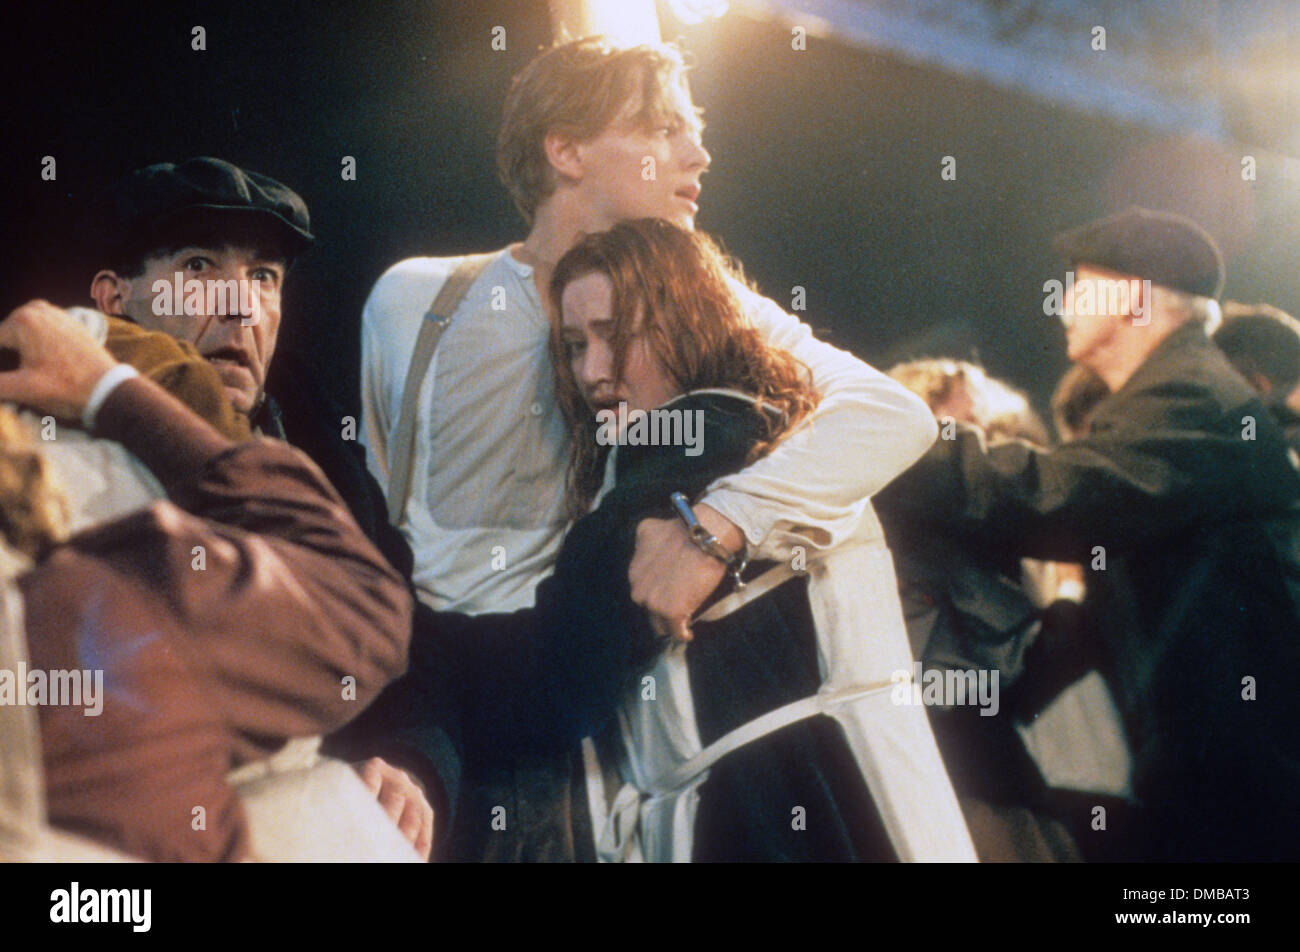 TITANIC 1997 Twentieth Century Fox film with Leonardo Di Caprio and Kate Winslet - Stock Image